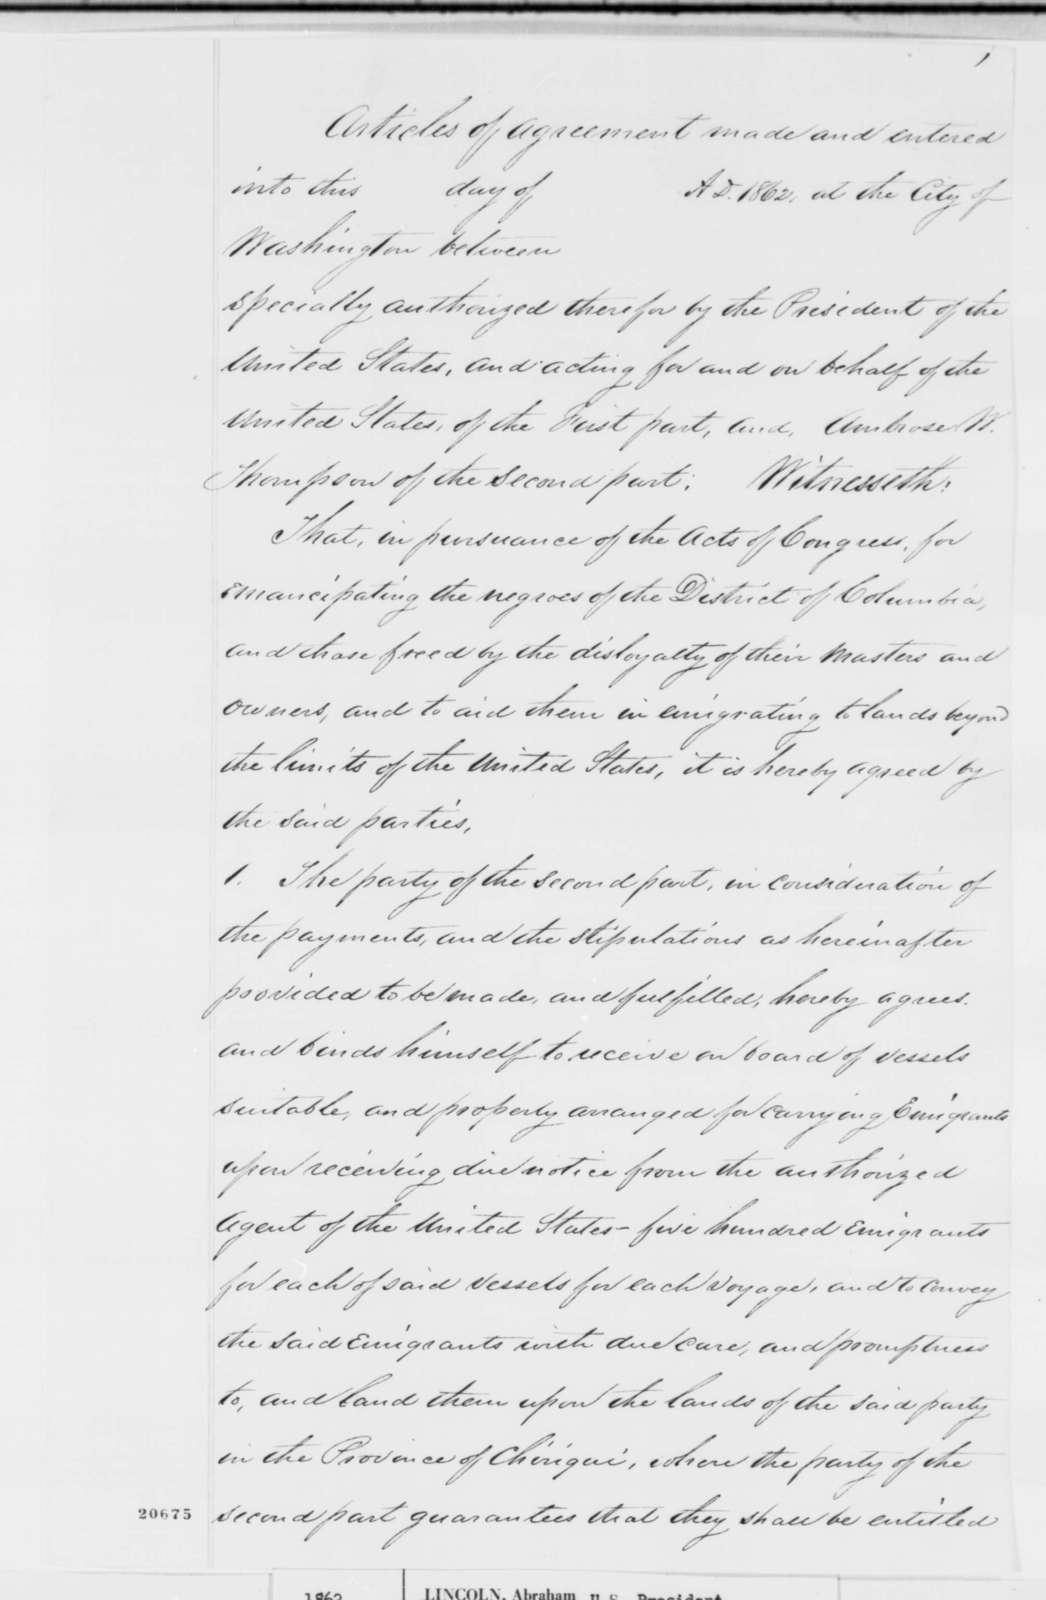 [Caleb B. Smith?], Thursday, September 11, 1862  (Draft of Agreement with Ambrose W. Thompson on Emigration of Freedmen to Granada)